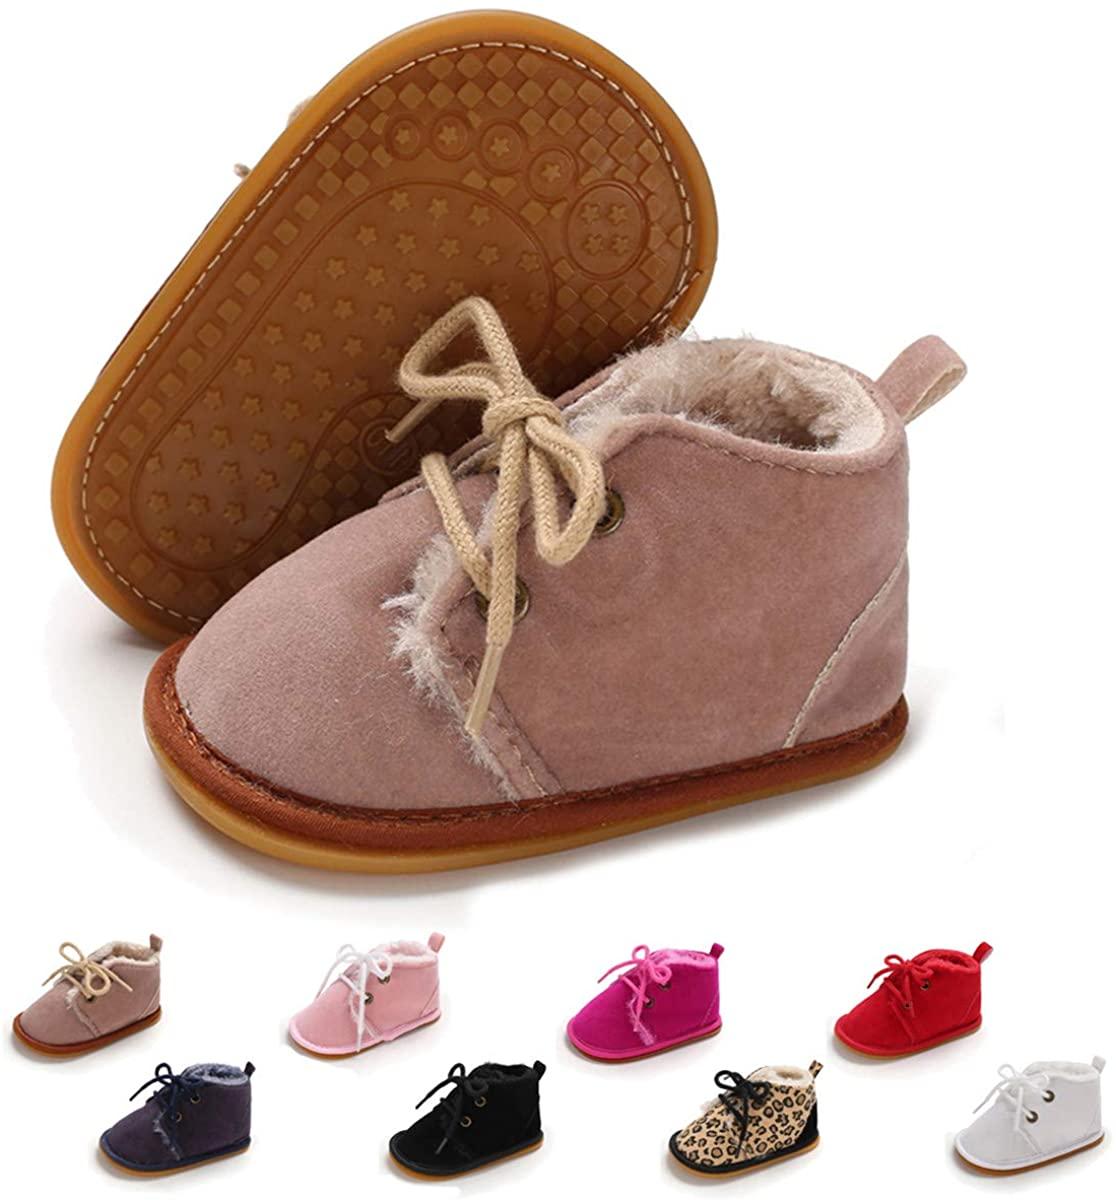 ENERCAKE Baby Booties Newborn Boy Girl Shoes Winter Warm Fur Lining Non-Slip Lace Up Prewalker Boots